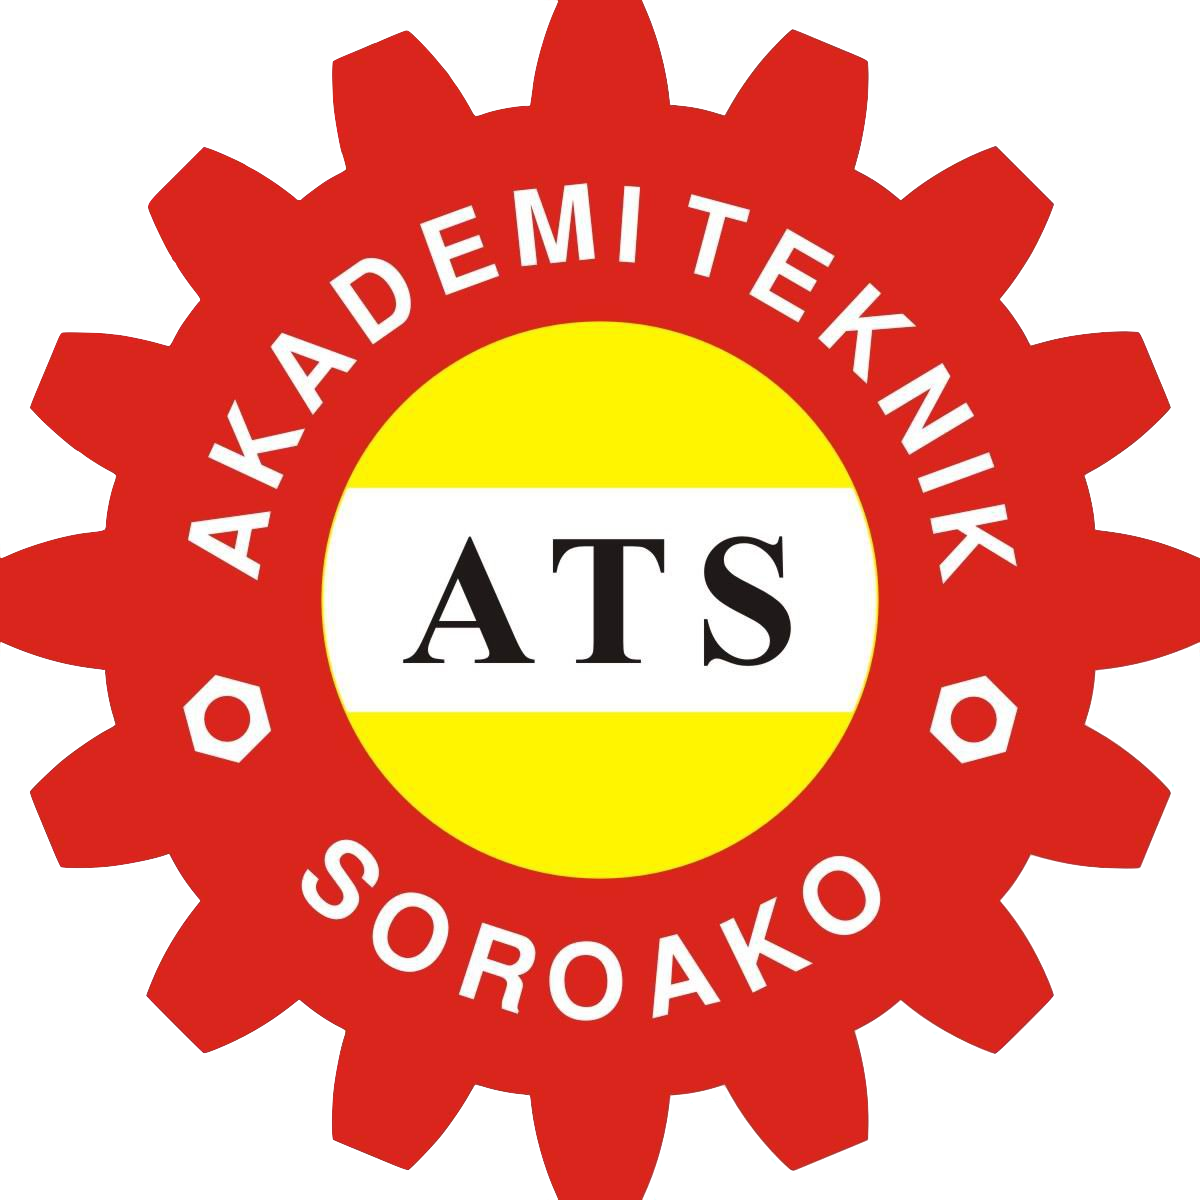 Akademi Teknik Soroako - Wikipedia bahasa Indonesia, ensiklopedia bebas